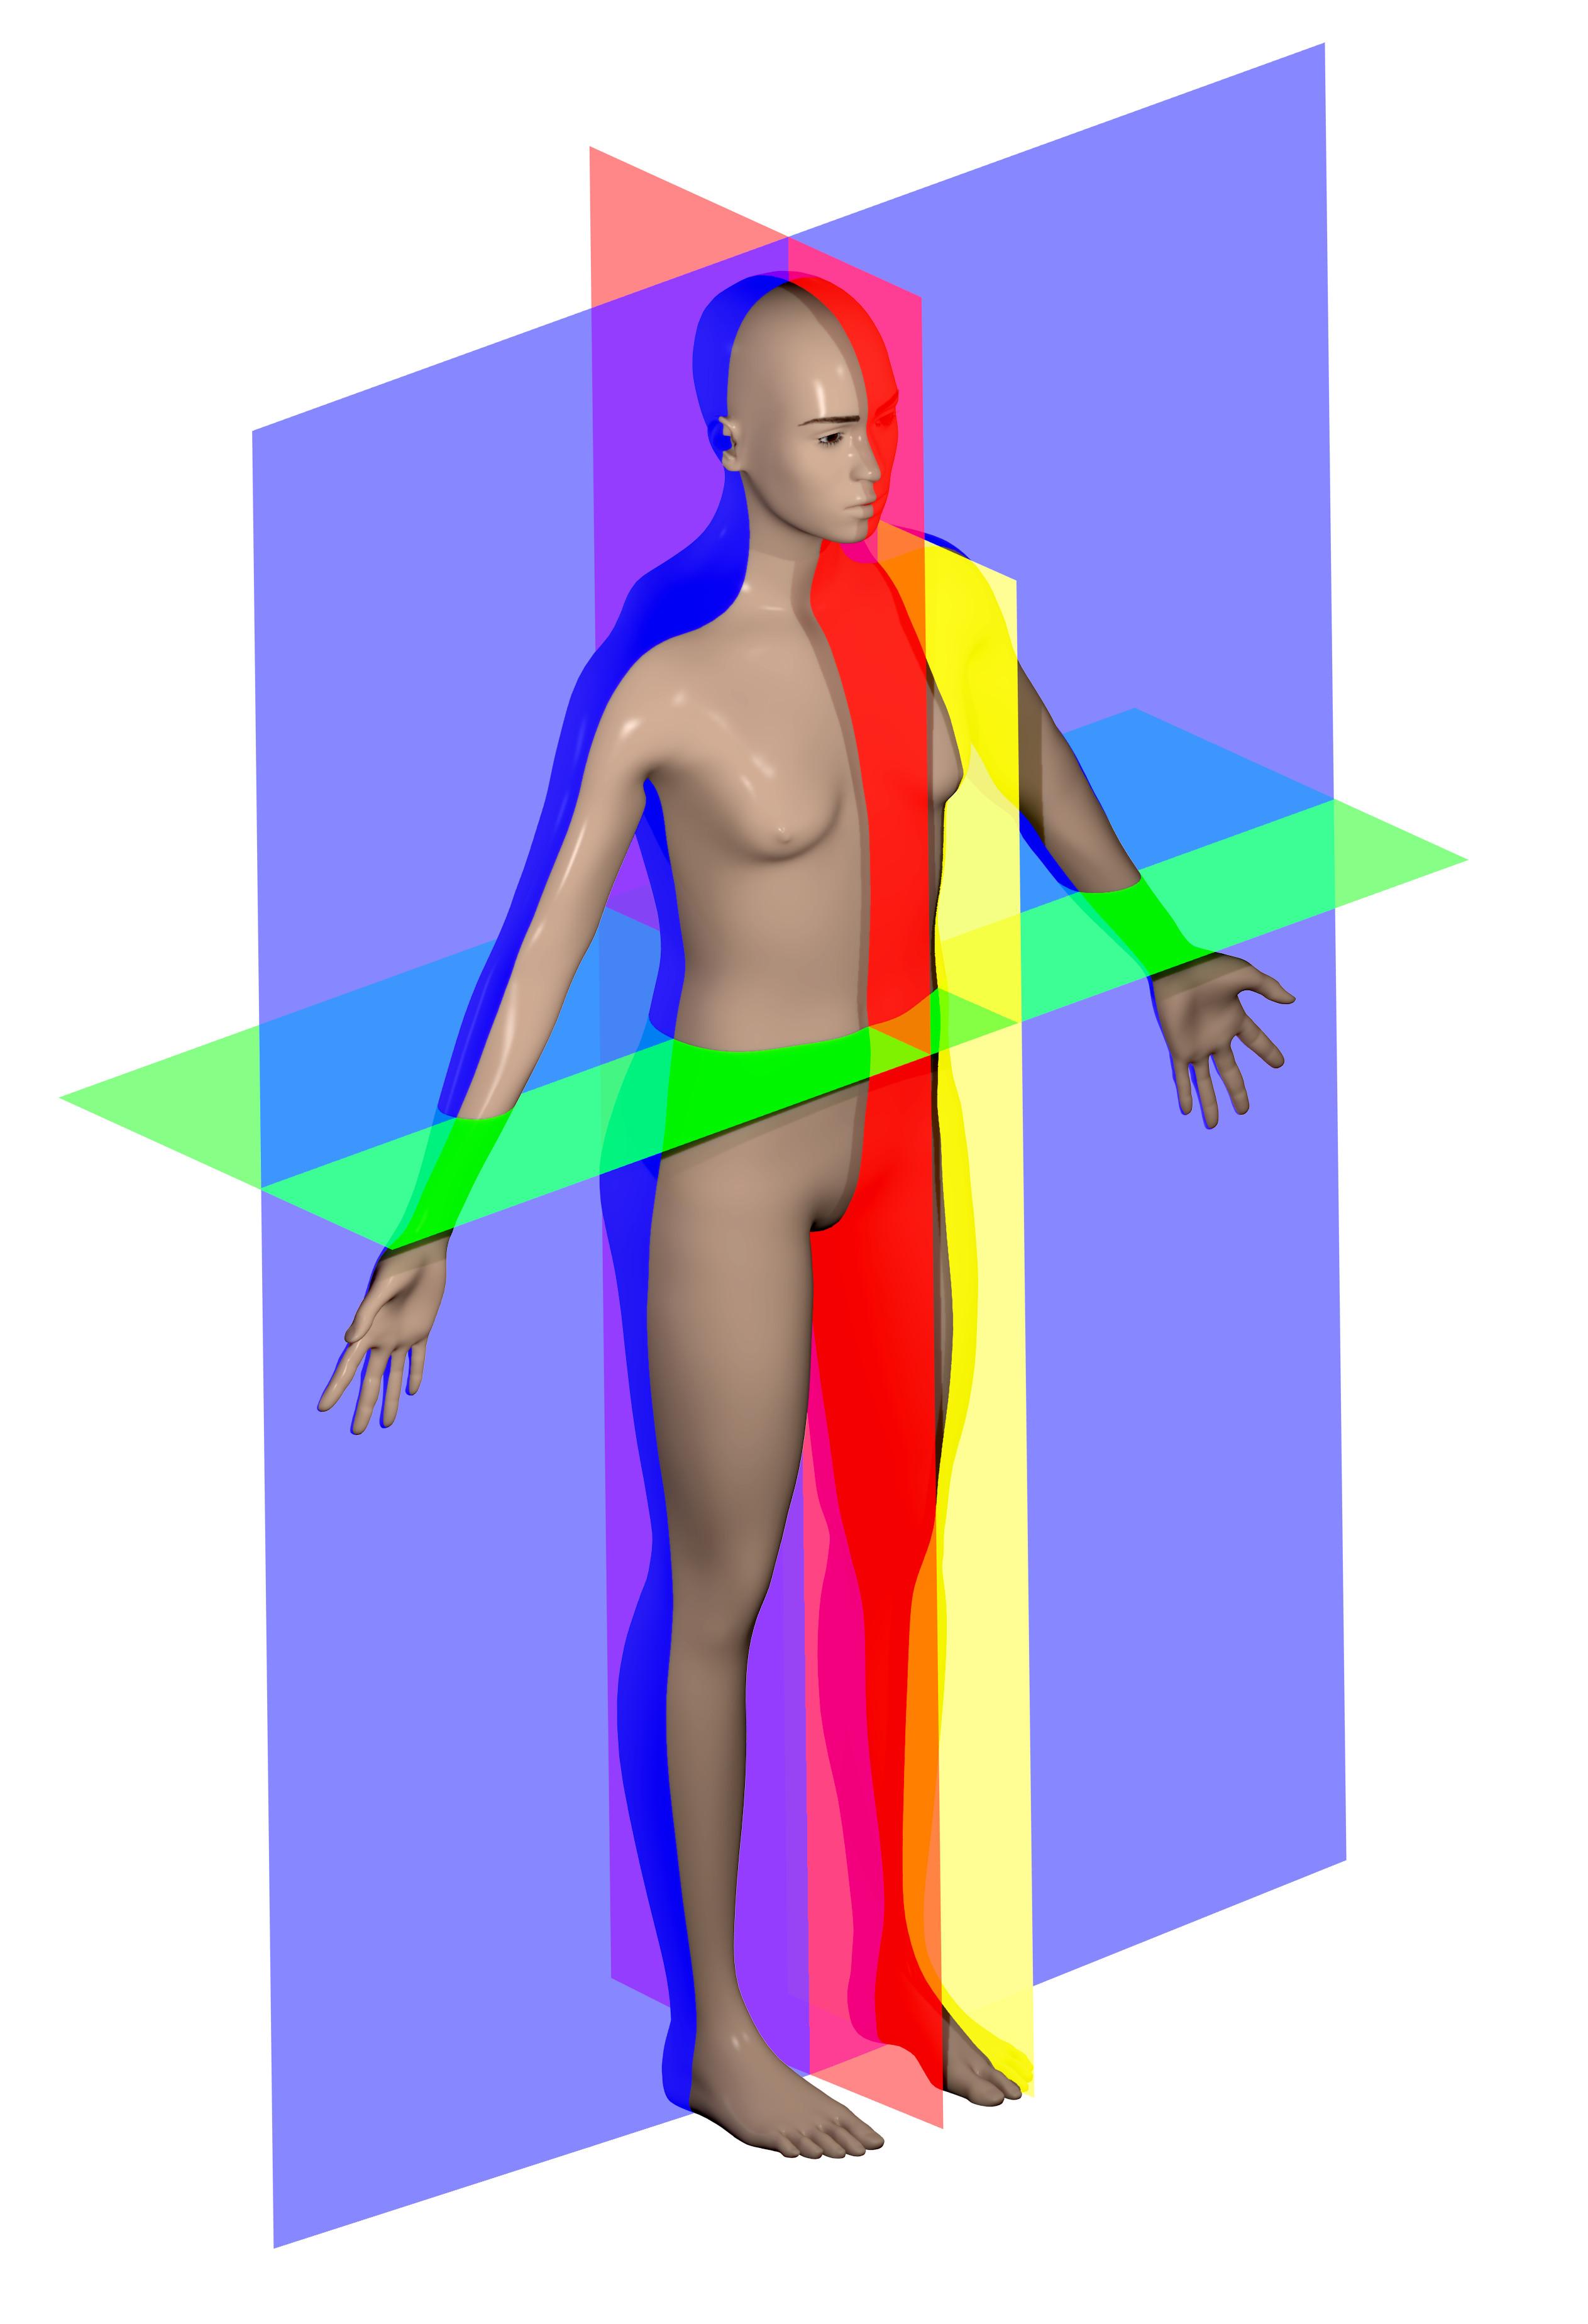 Human anatomy planes, 2014